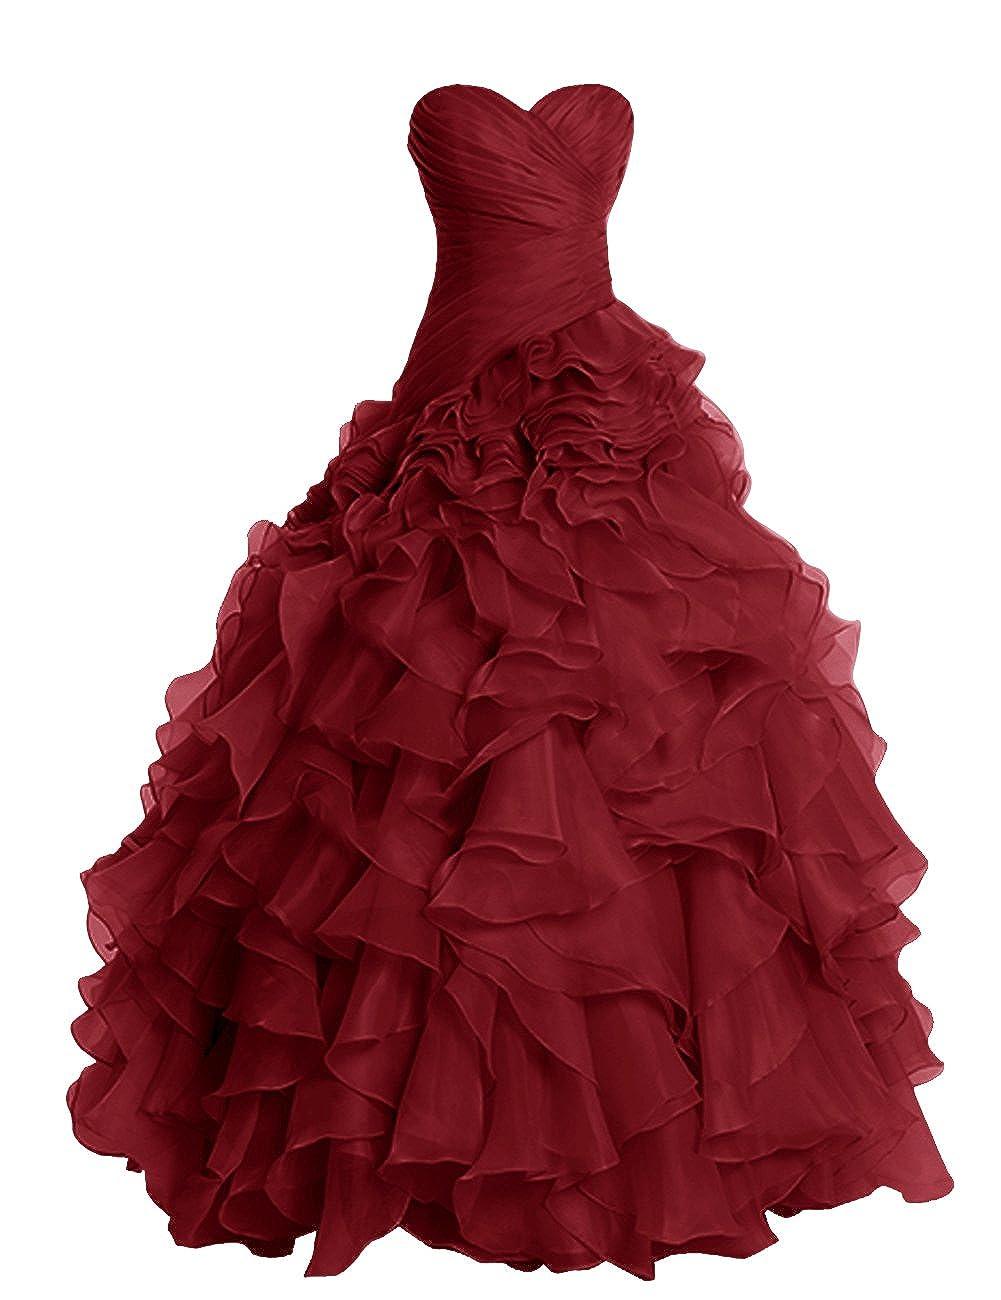 Burgundy Dresstells® Long Prom Dress Fluffy Bridesmaid Dress Wedding Dress with Ruffles